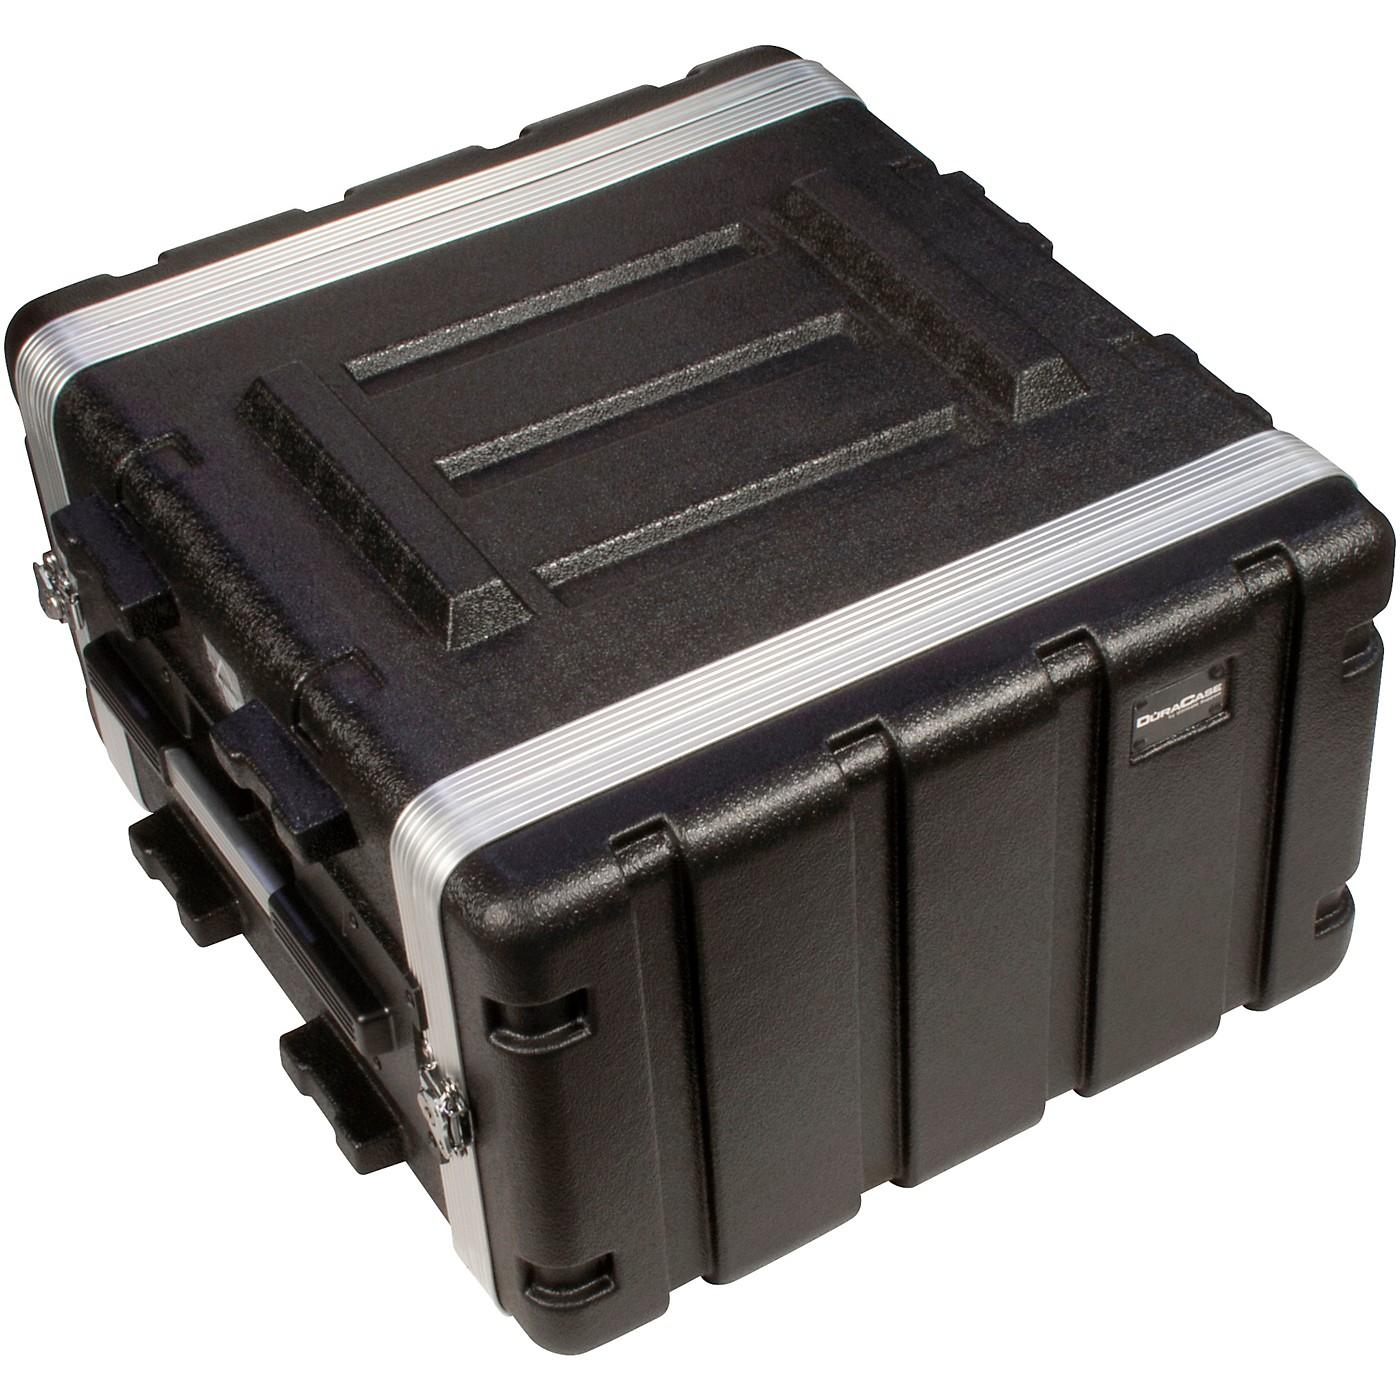 Ultimate Support DuraCase UR-6L Portable 6-Space Rackmount Case thumbnail